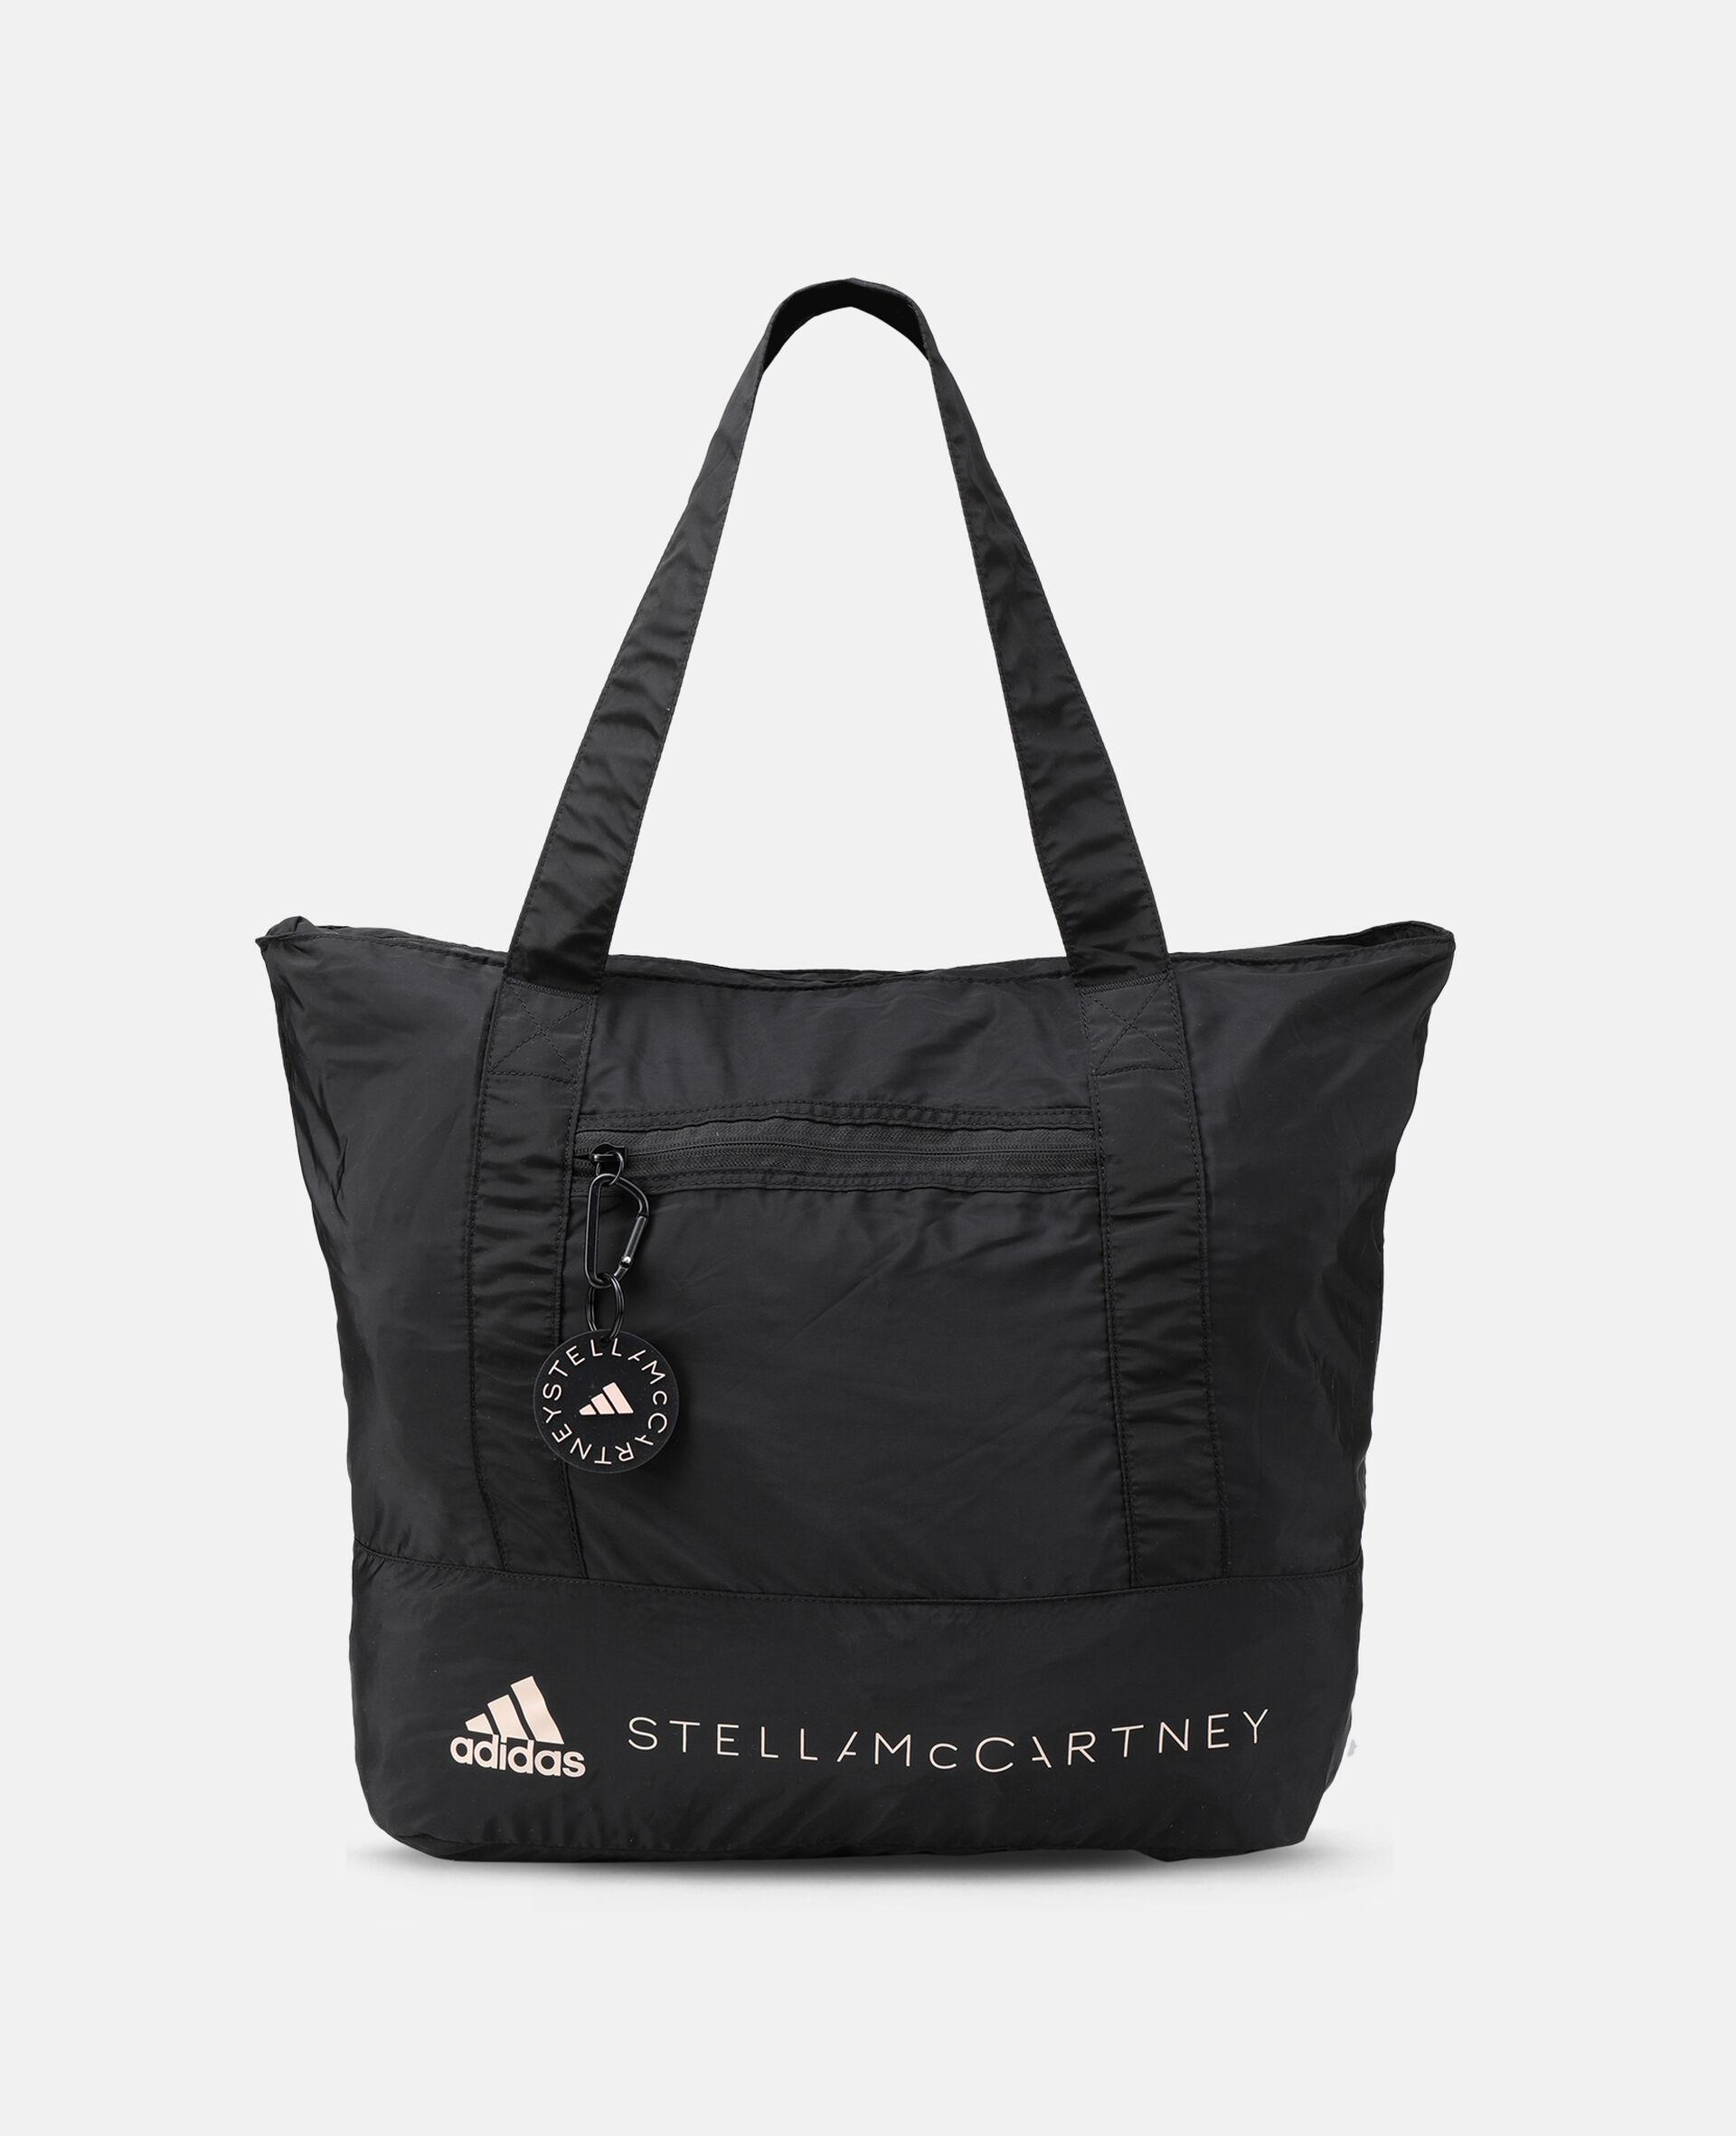 Black Printed Tote Bag -Black-large image number 0